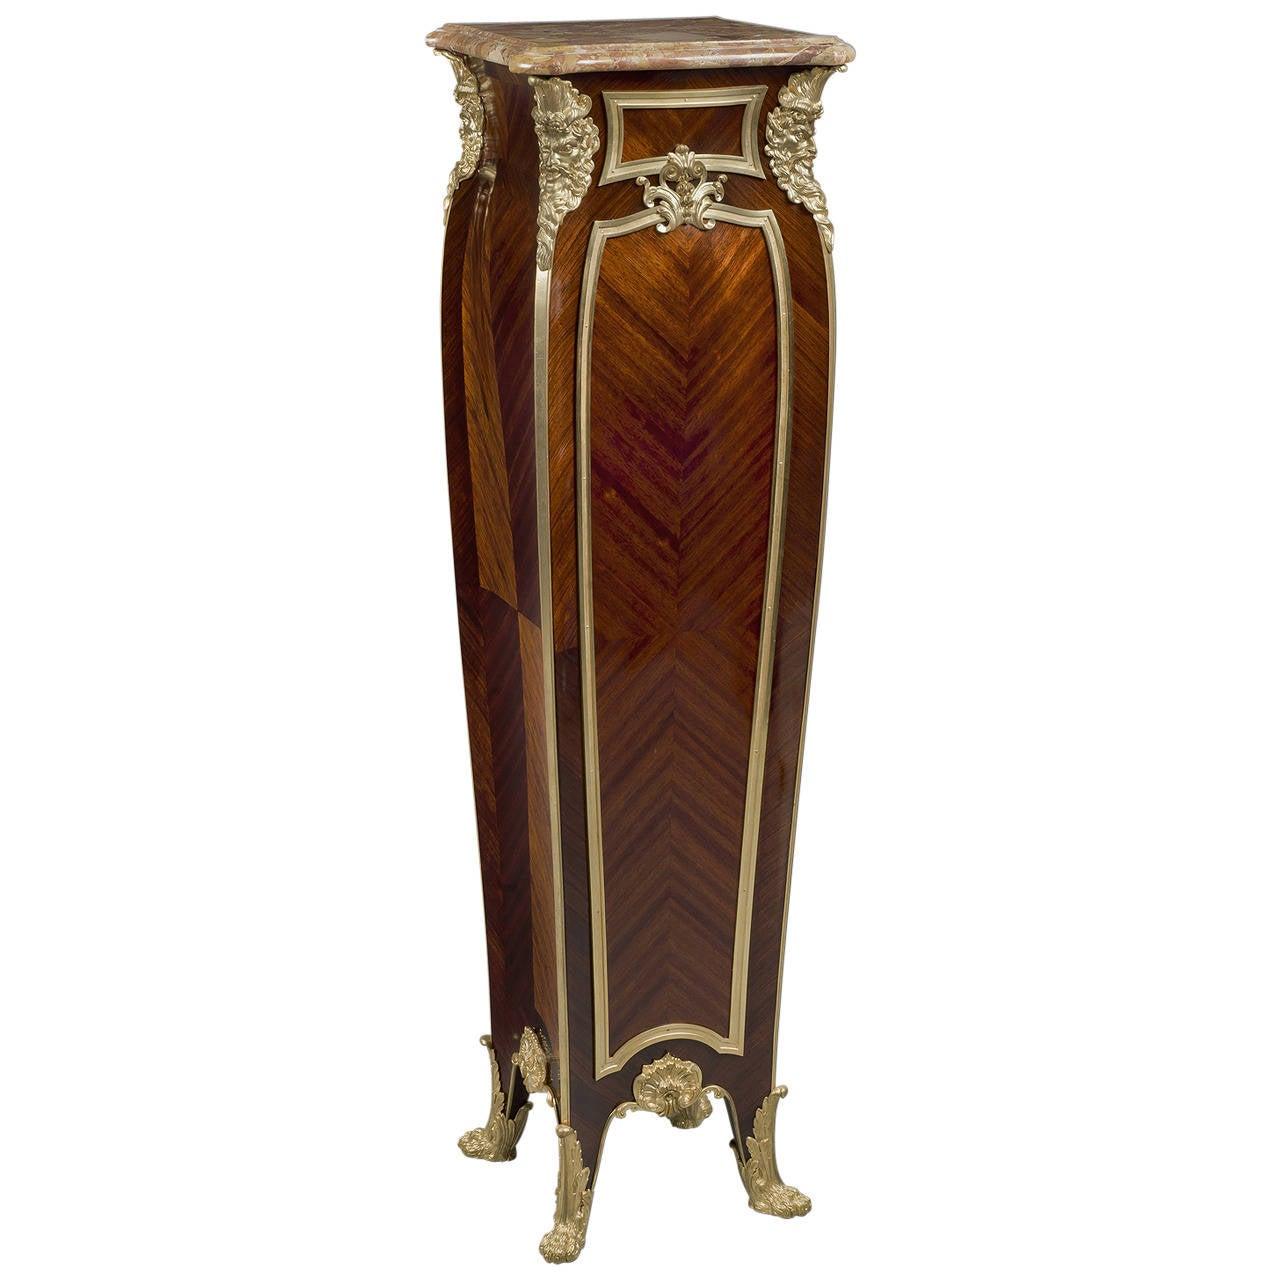 Louis XV Style Pedestal with Marble Top by Zwiener Jansen Successeur